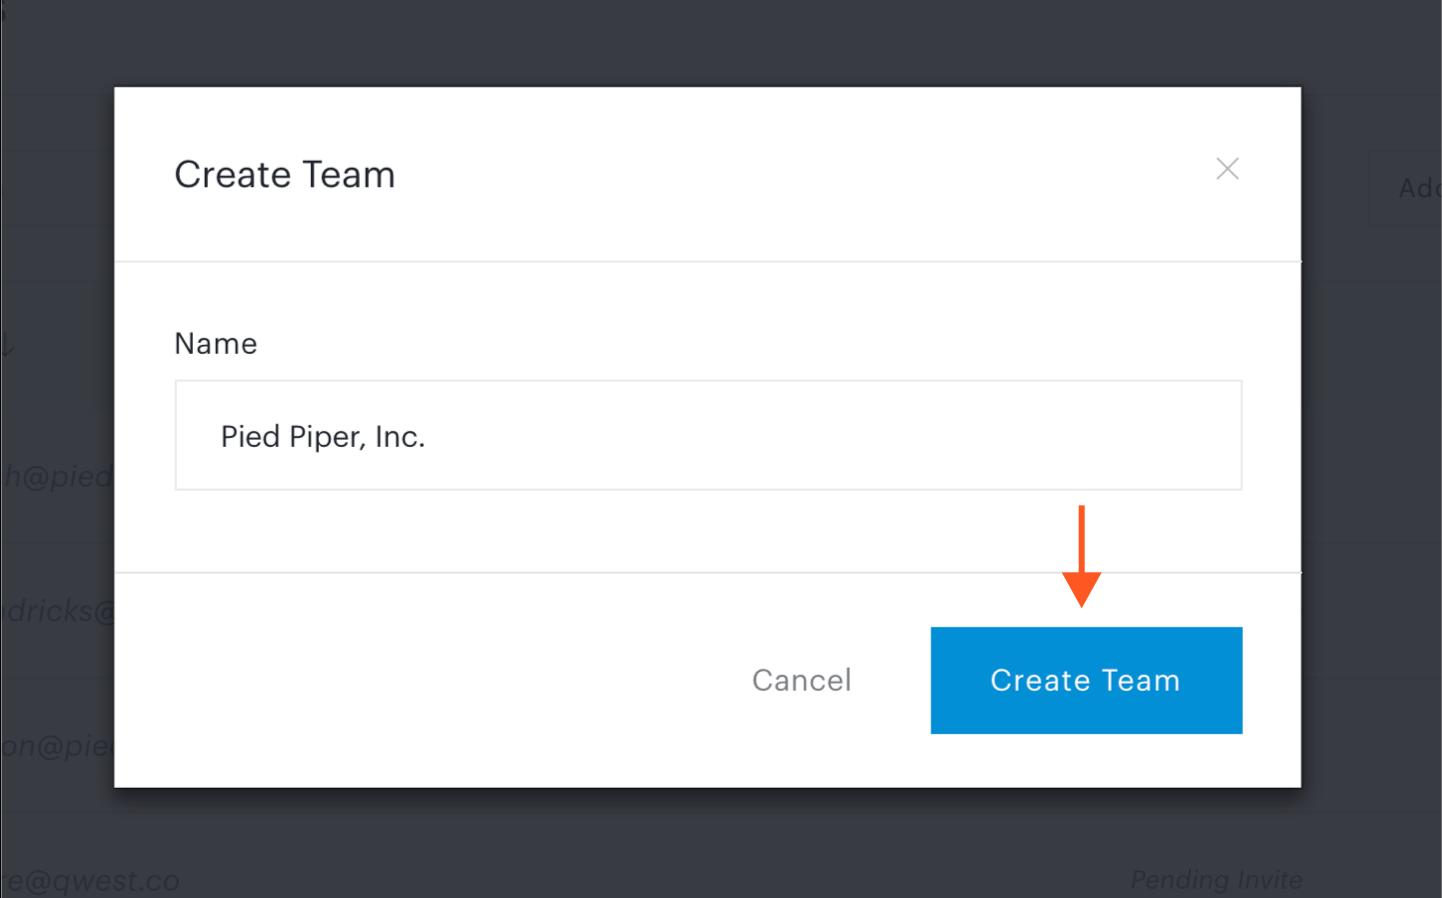 Click Create Team button